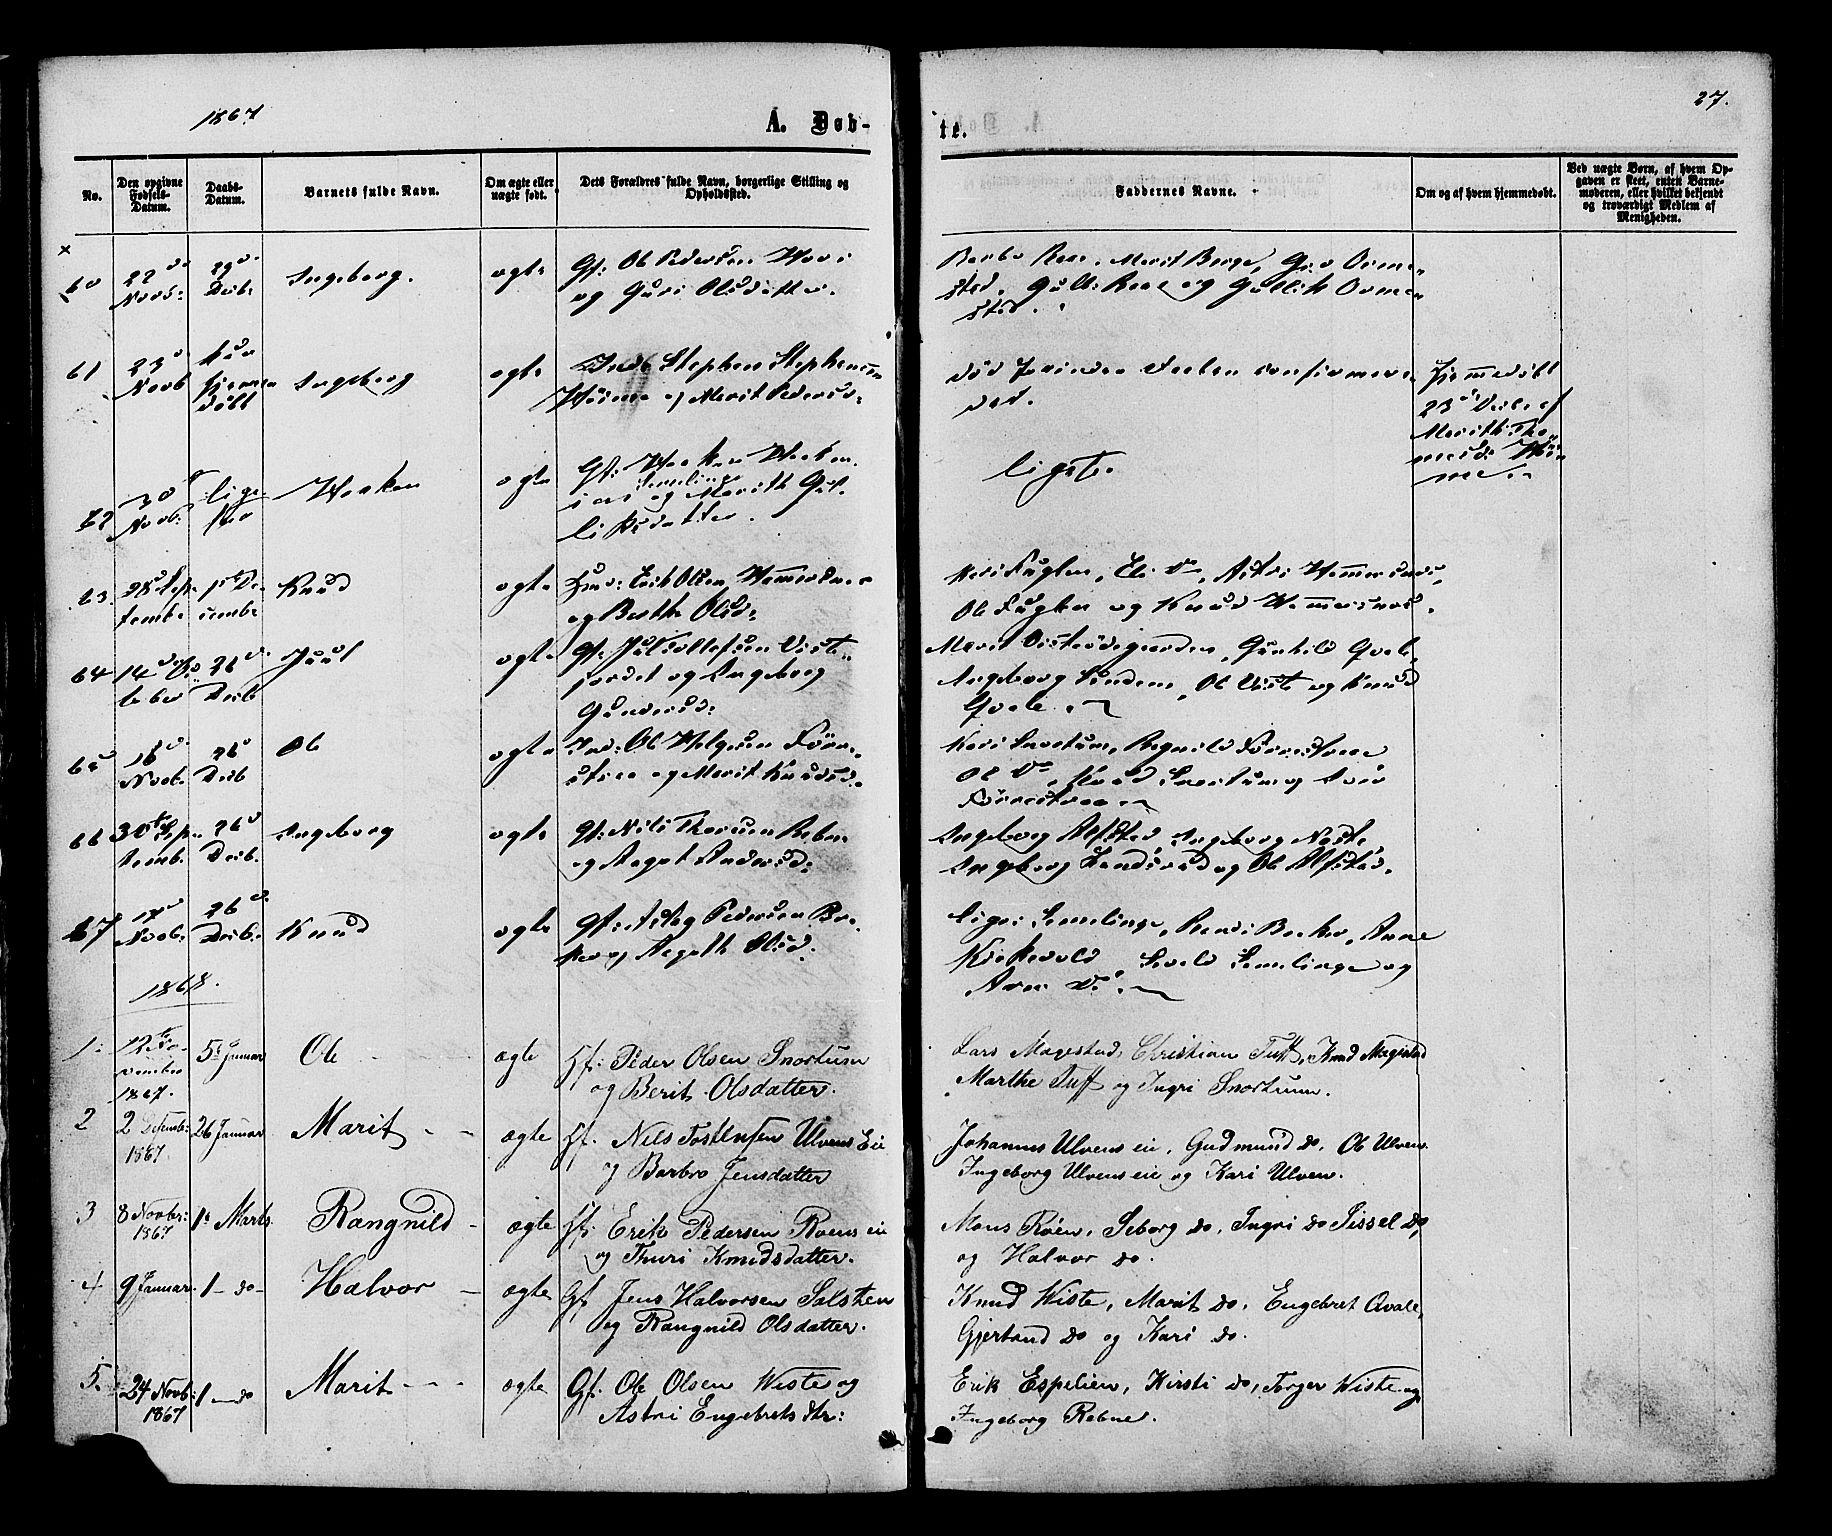 SAH, Vestre Slidre prestekontor, Ministerialbok nr. 3, 1865-1880, s. 27